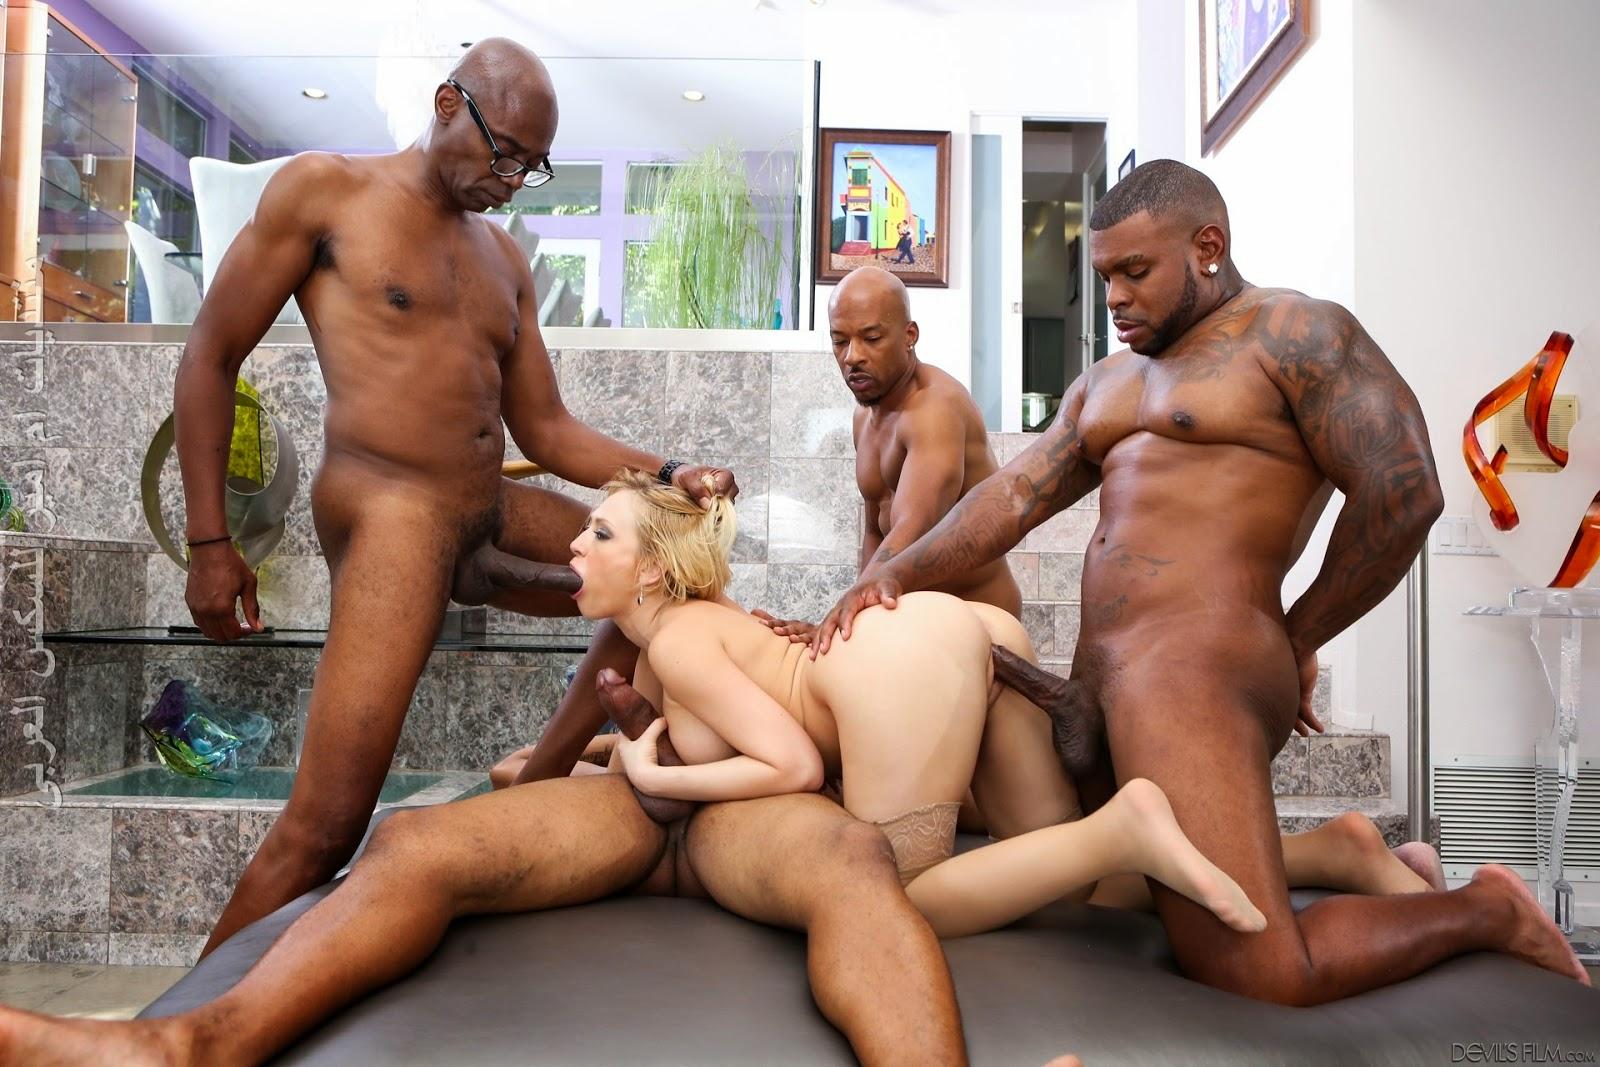 Nigger anal sex, fetish wet clit